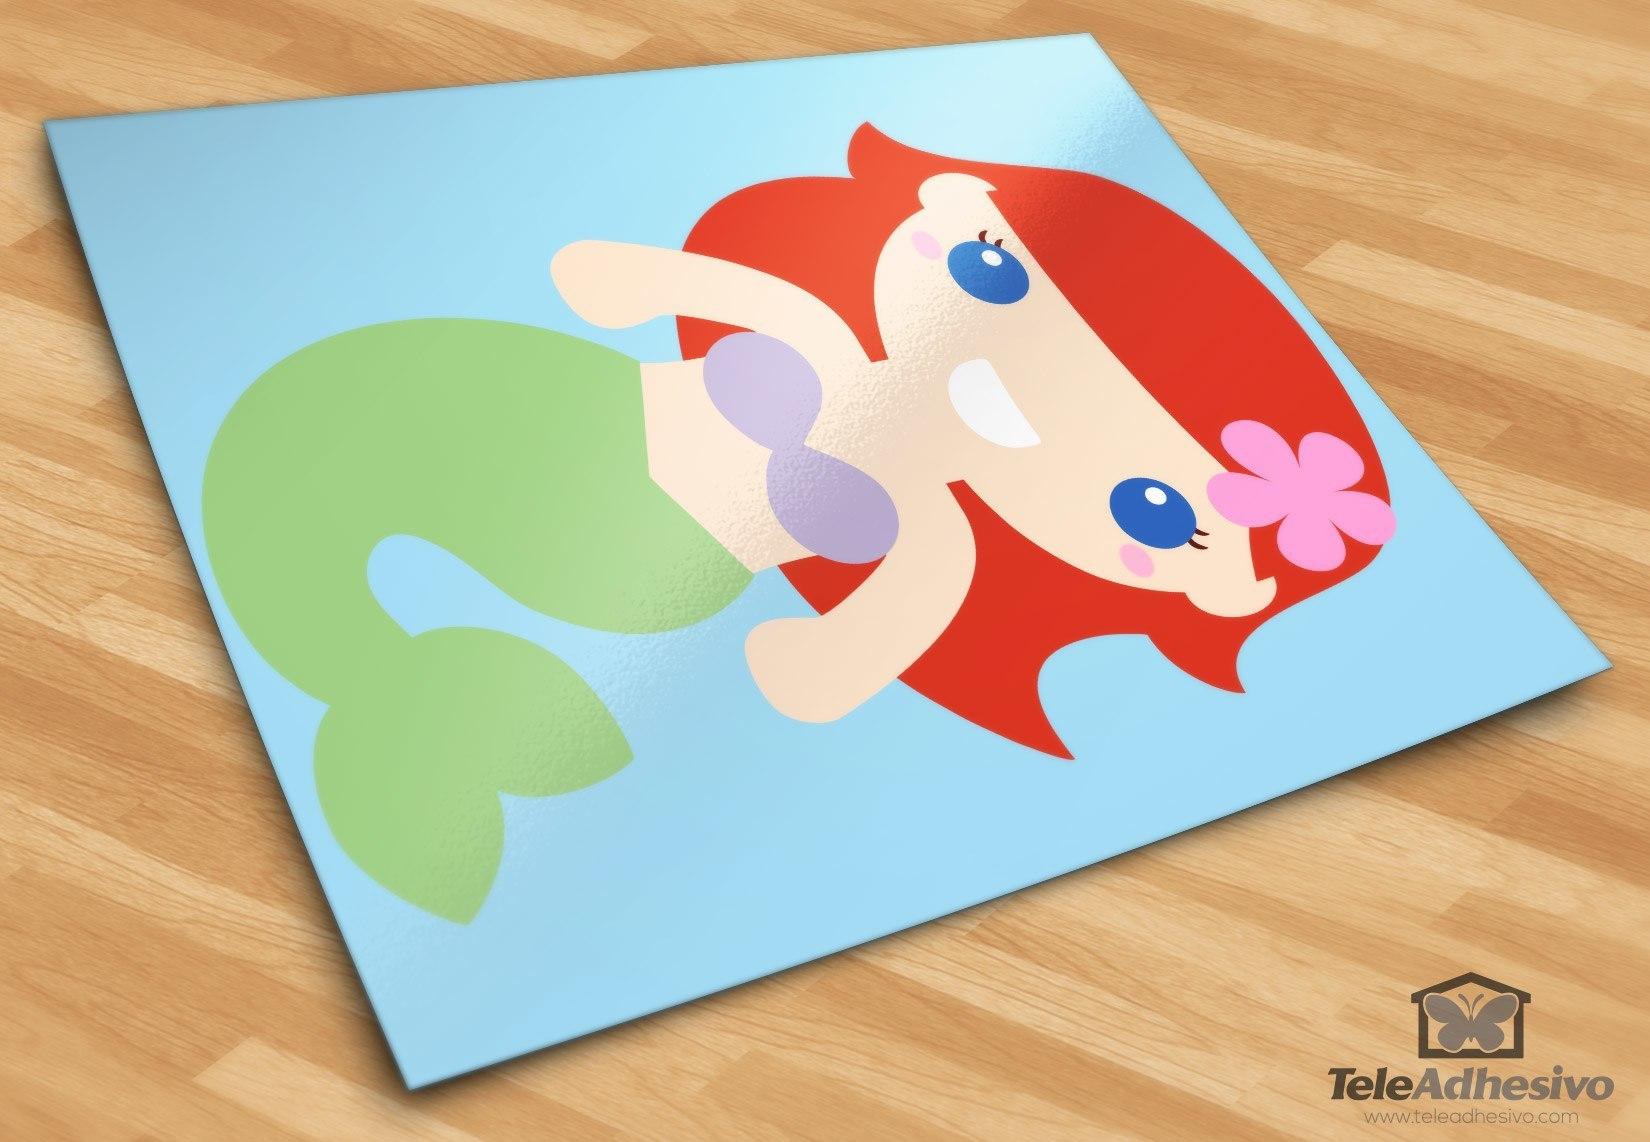 Kinderzimmer Wandtattoo: Die kleine Meerjungfrau